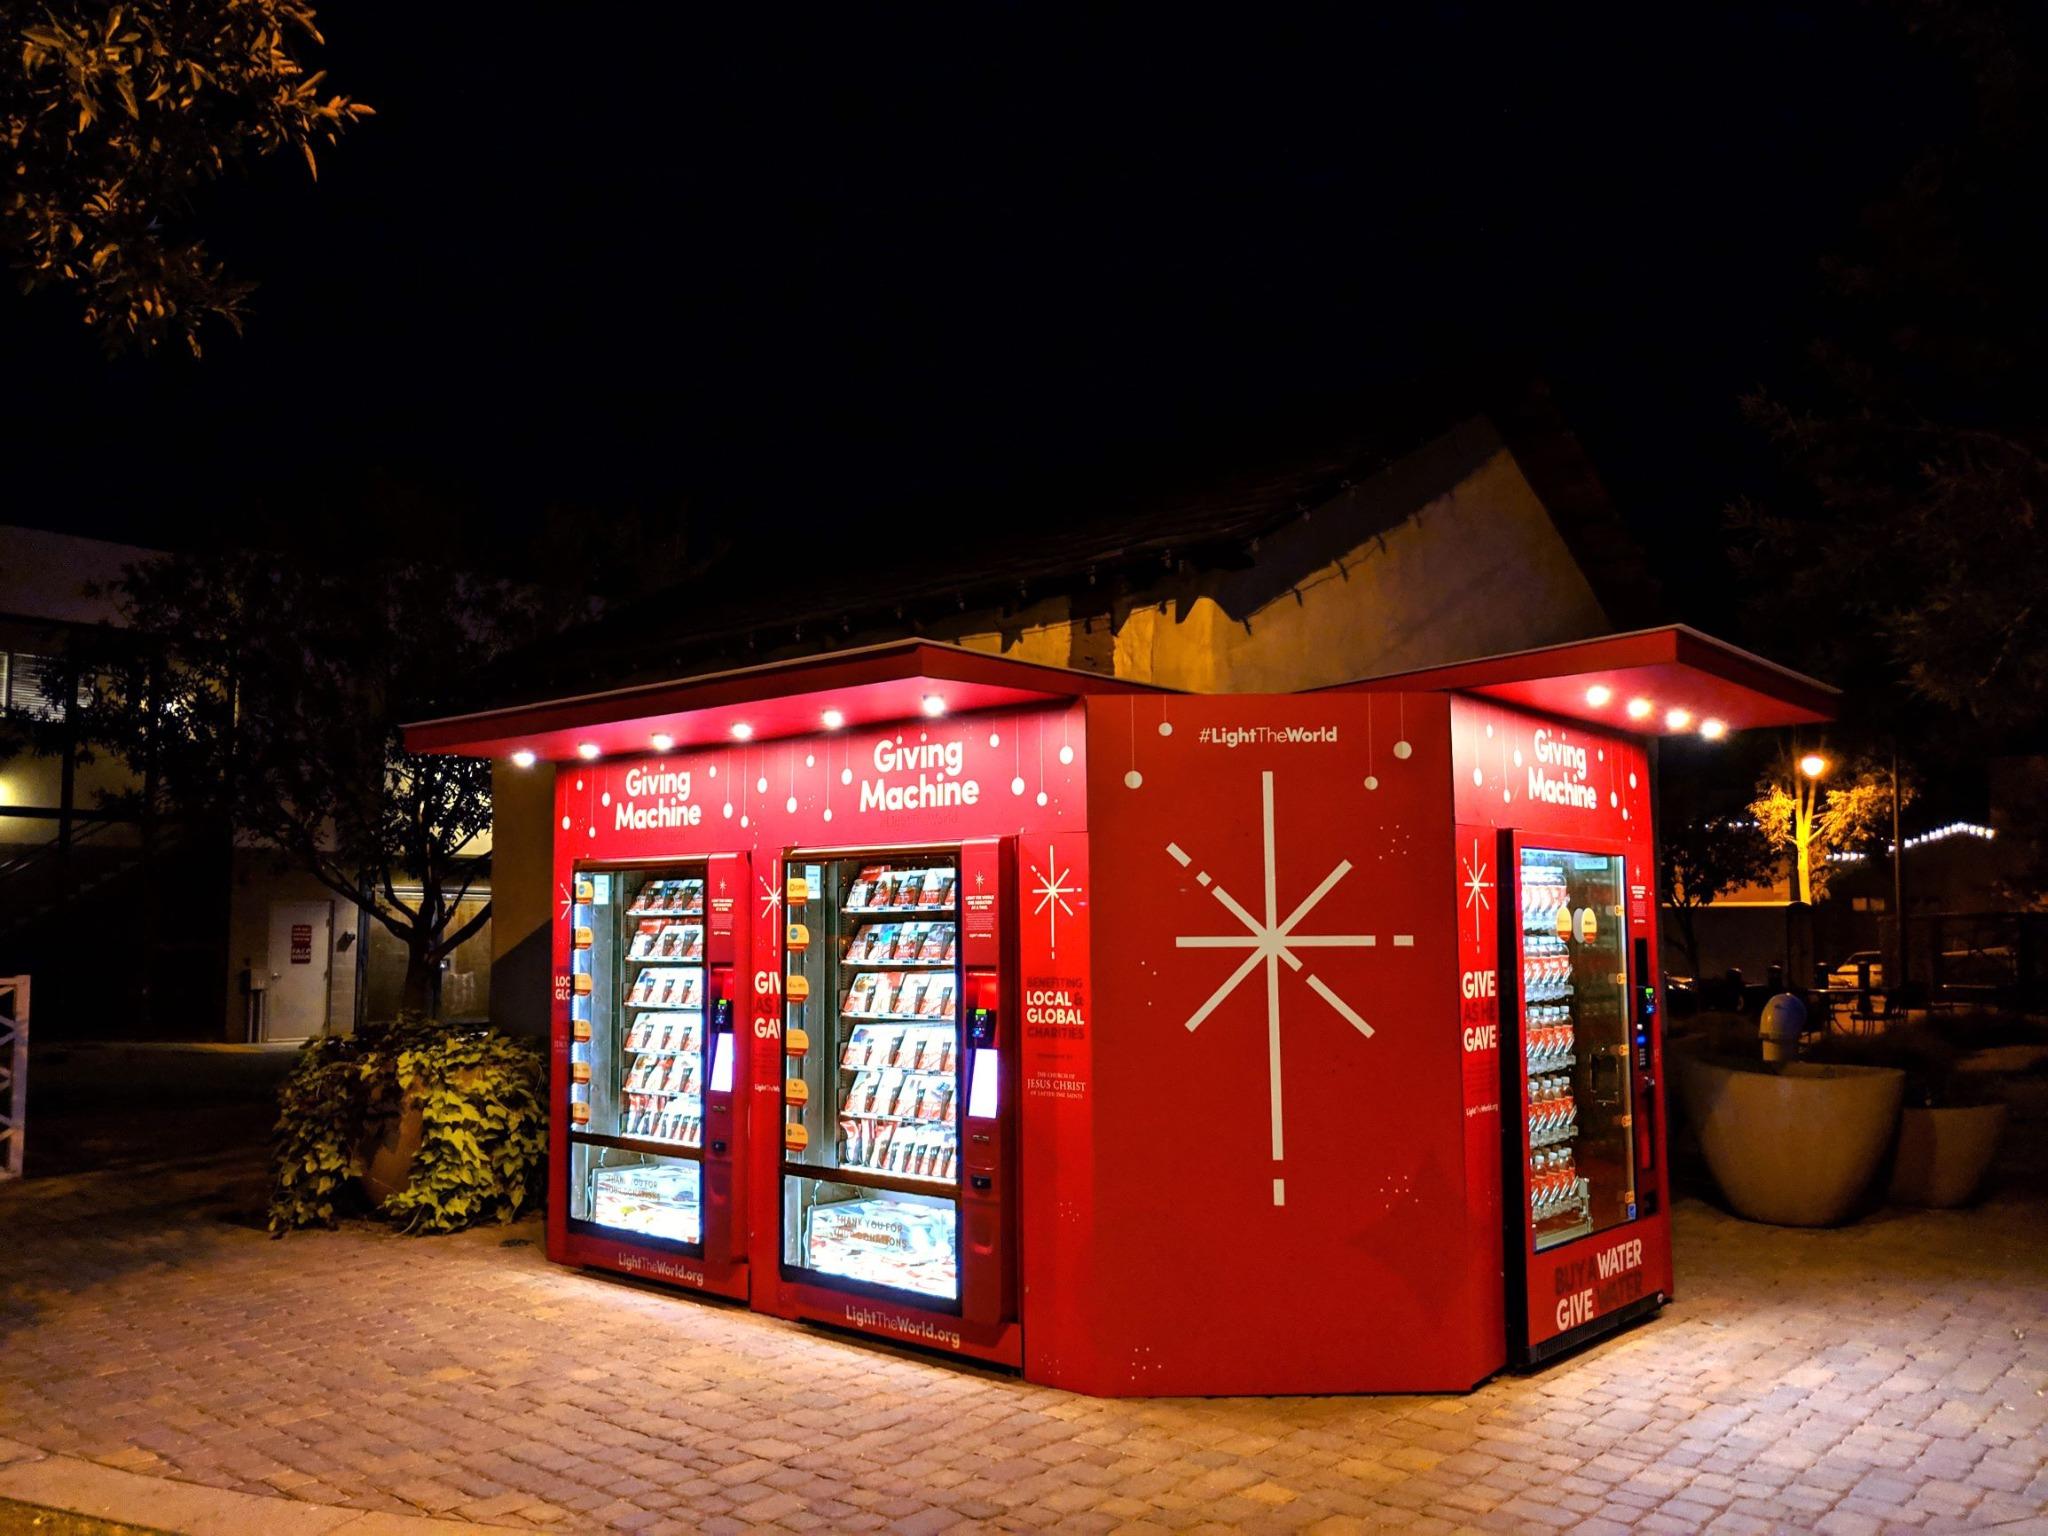 A Giving Machine in Gilbert, Arizona.